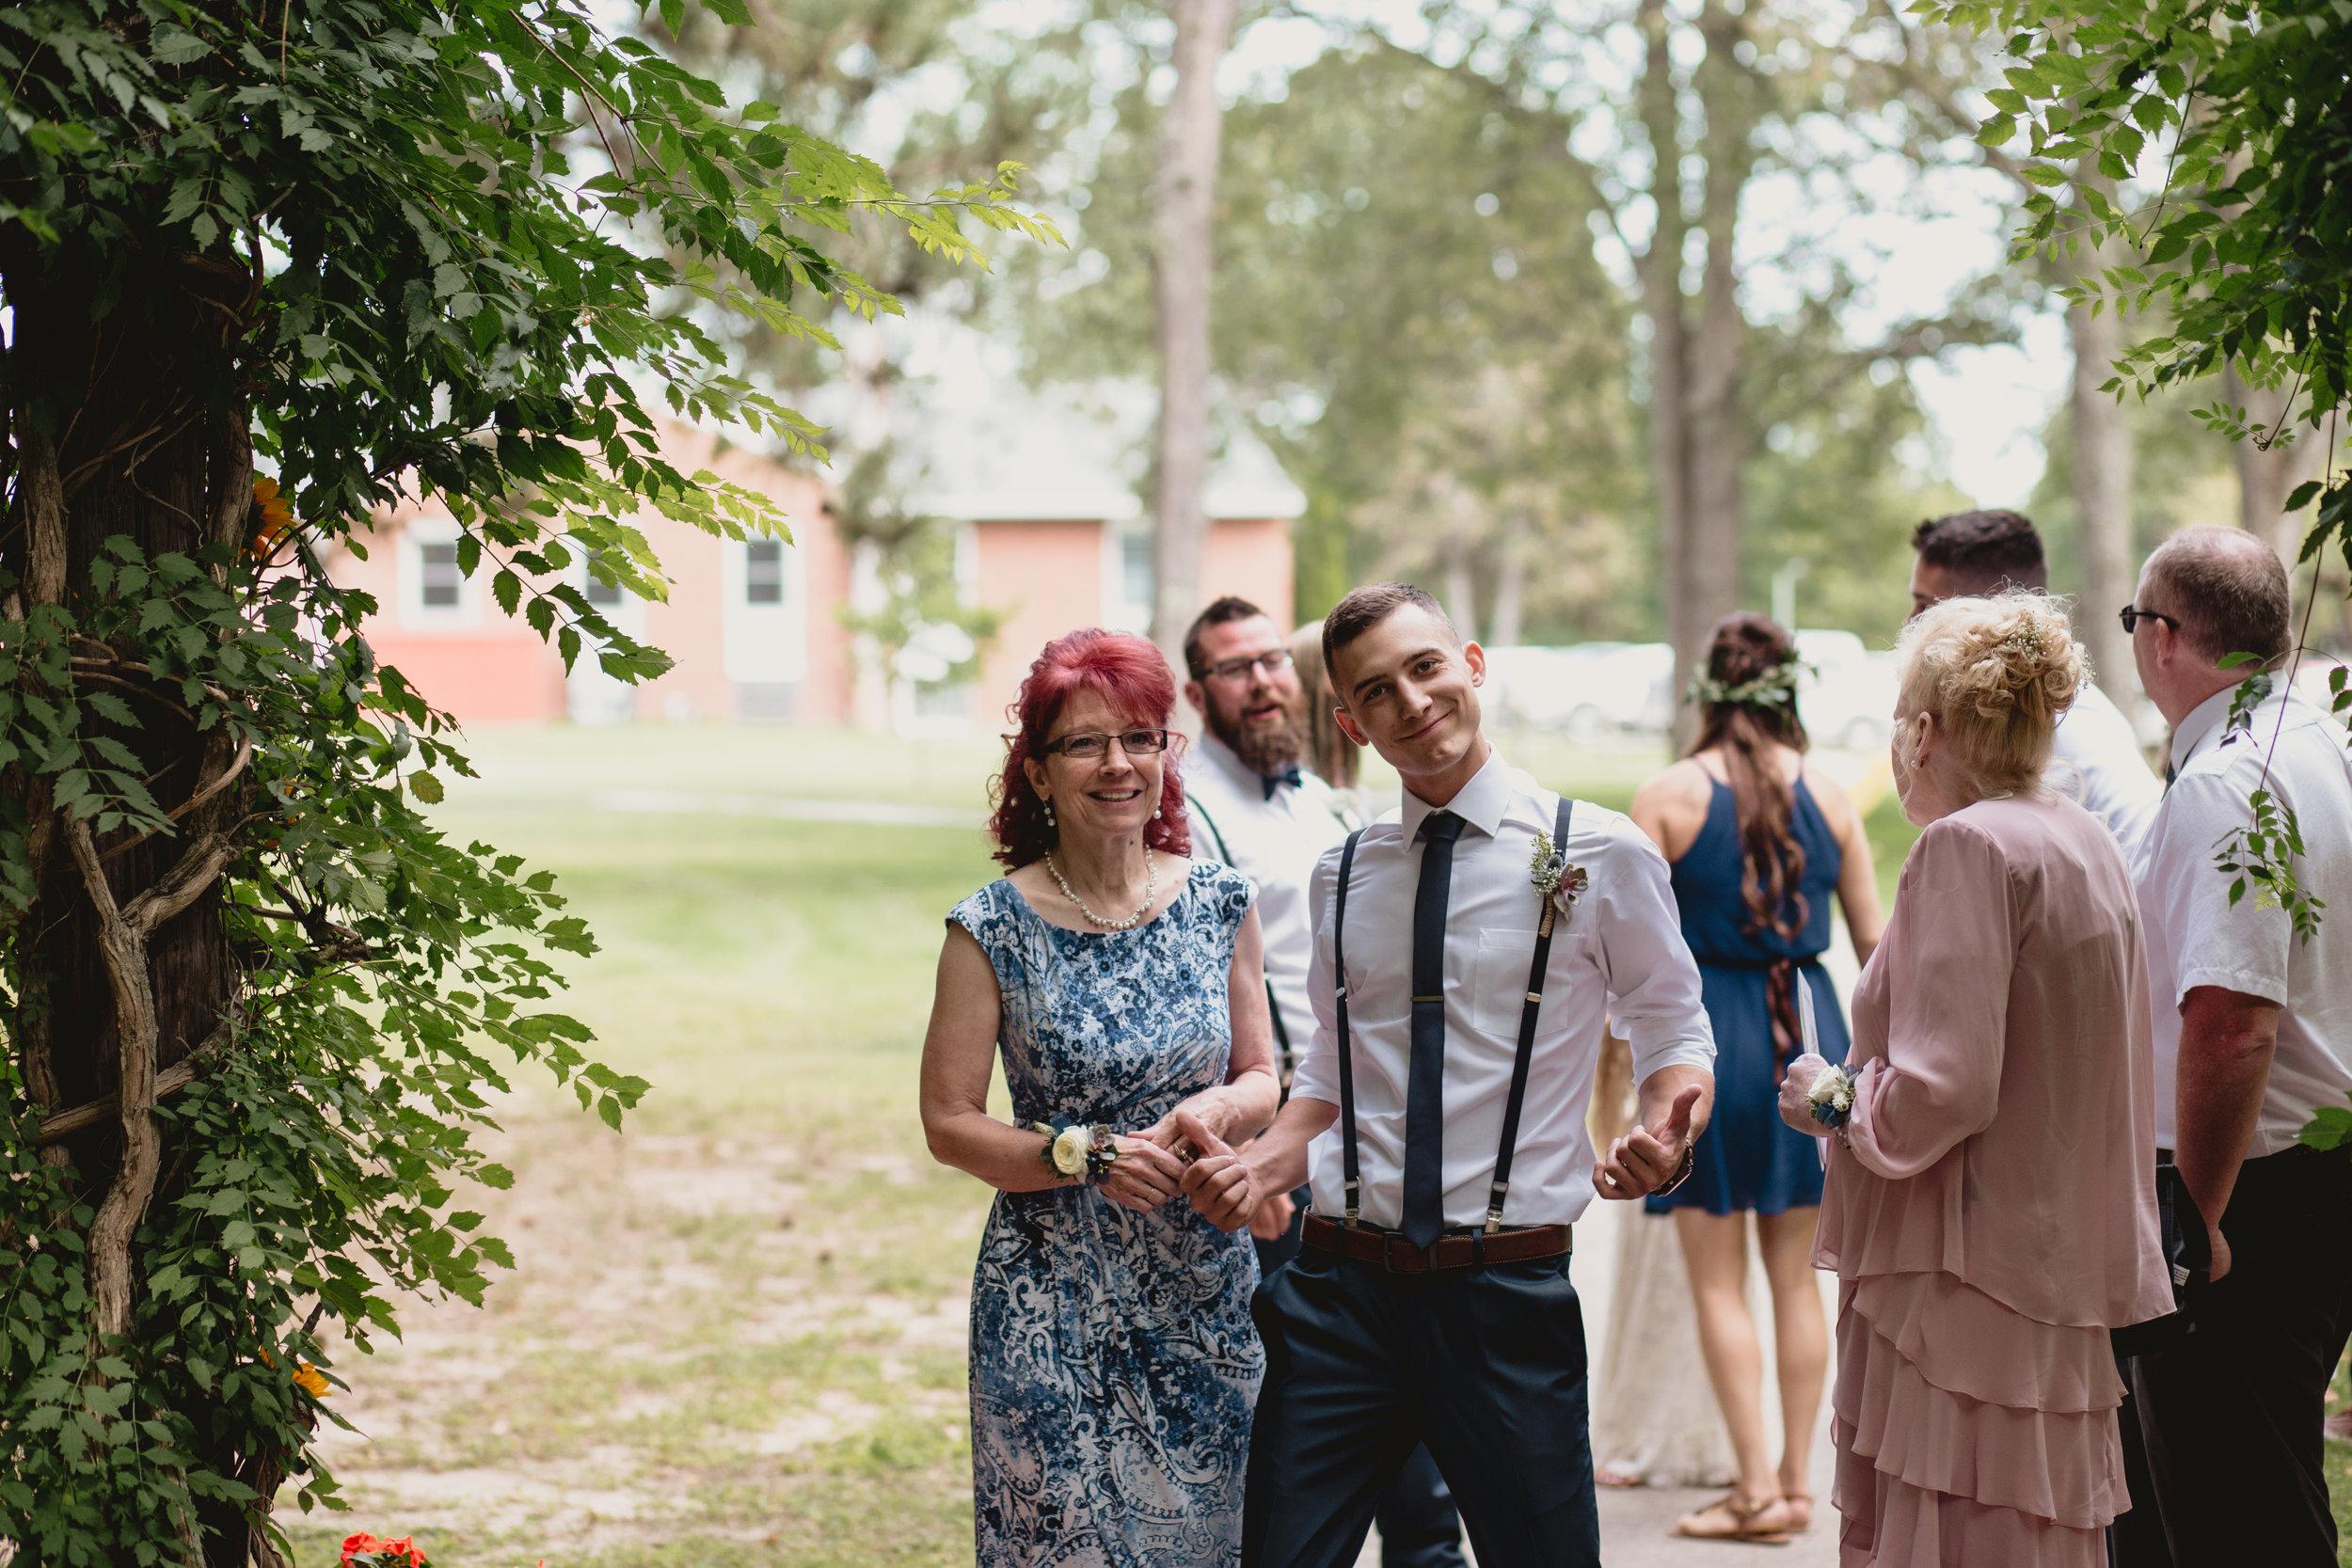 west-michigan-wedding-photographer-whitehall-rachel-austin-chapel-in-the-pines-196.jpg